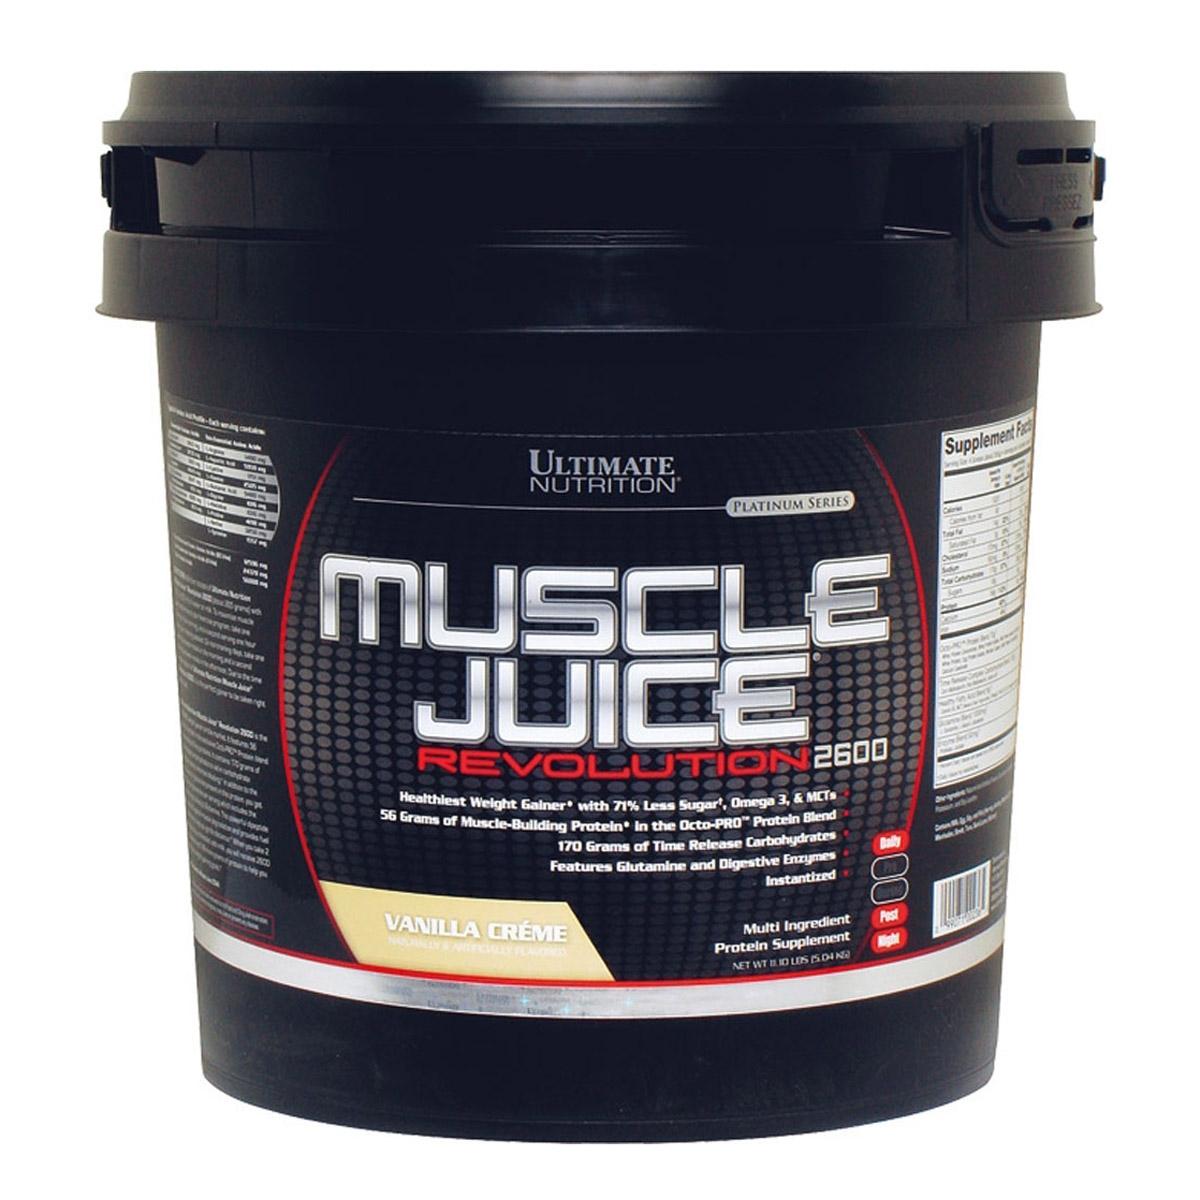 Health Designs: Ultimate Nutrition Muscle Juice Revolution